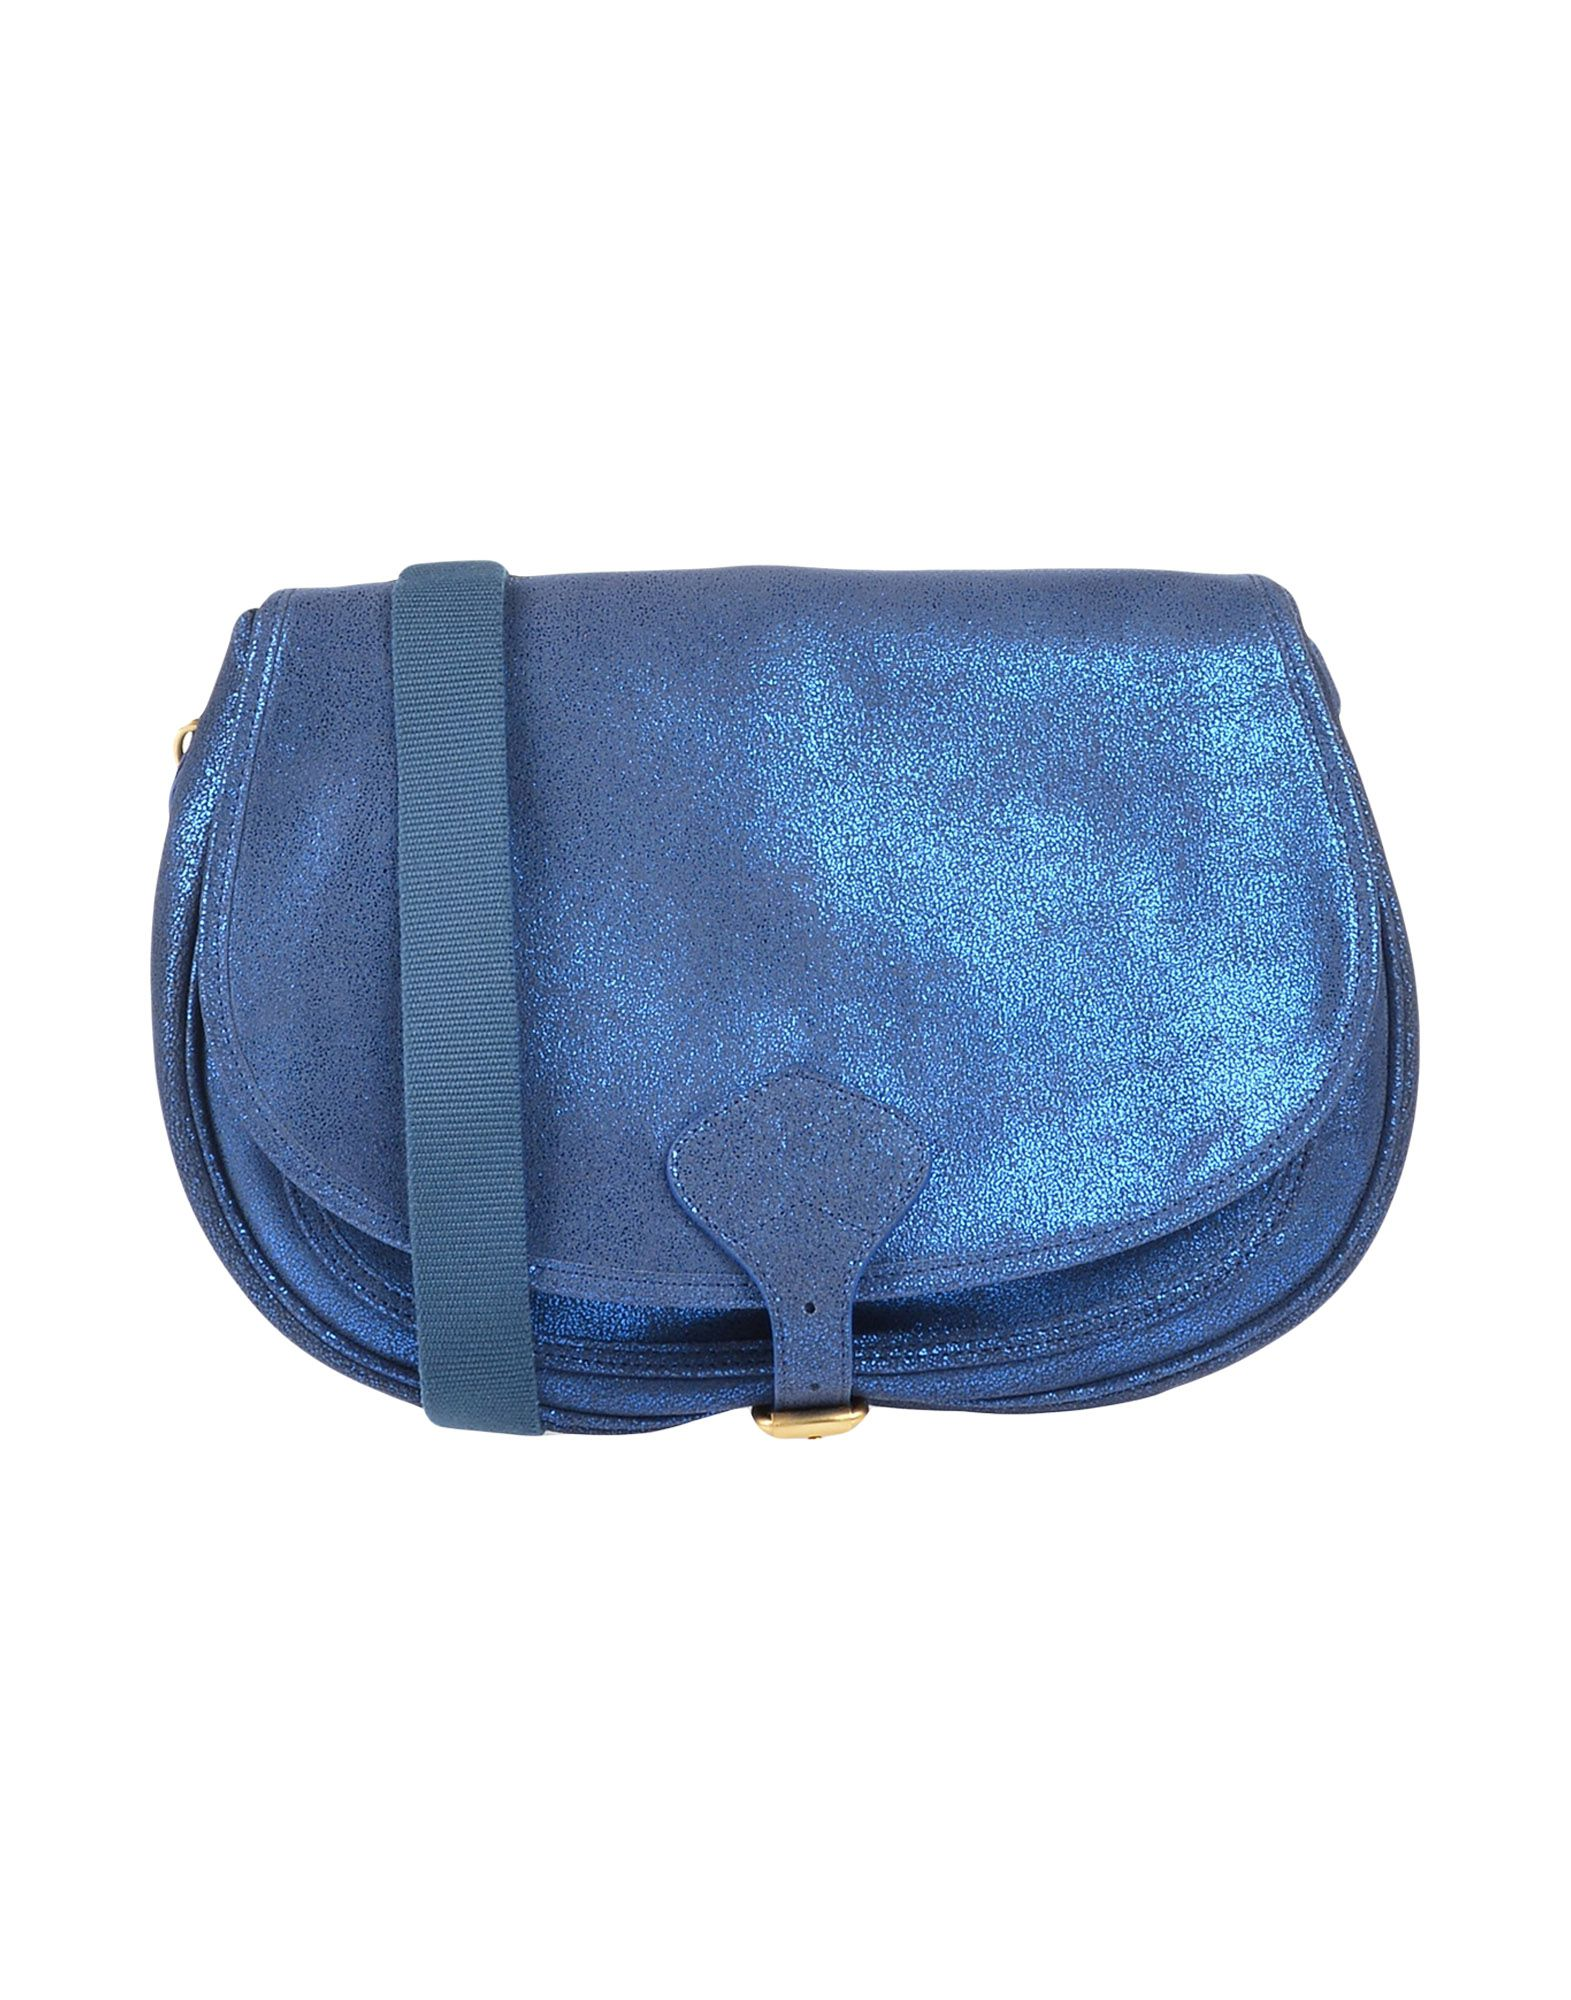 AVRIL GAU Handbags in Dark Blue